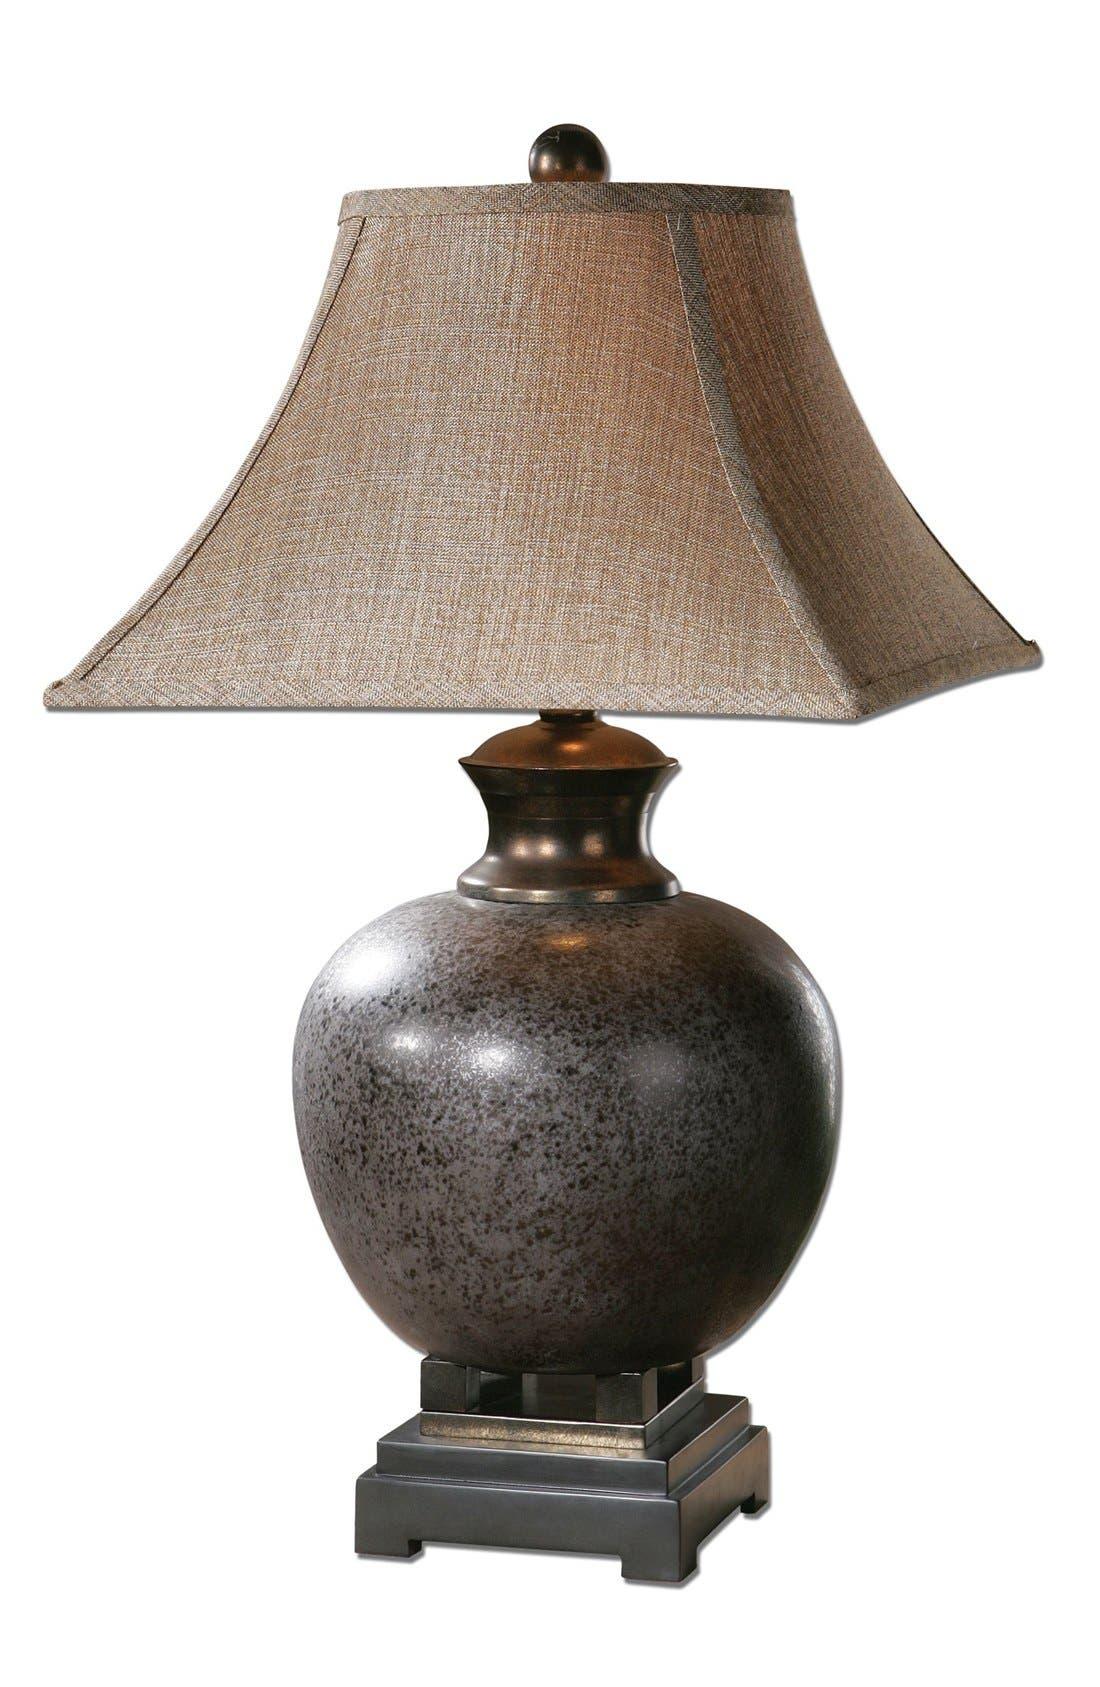 Alternate Image 1 Selected - Uttermost 'Villaga' Ceramic Table Lamp